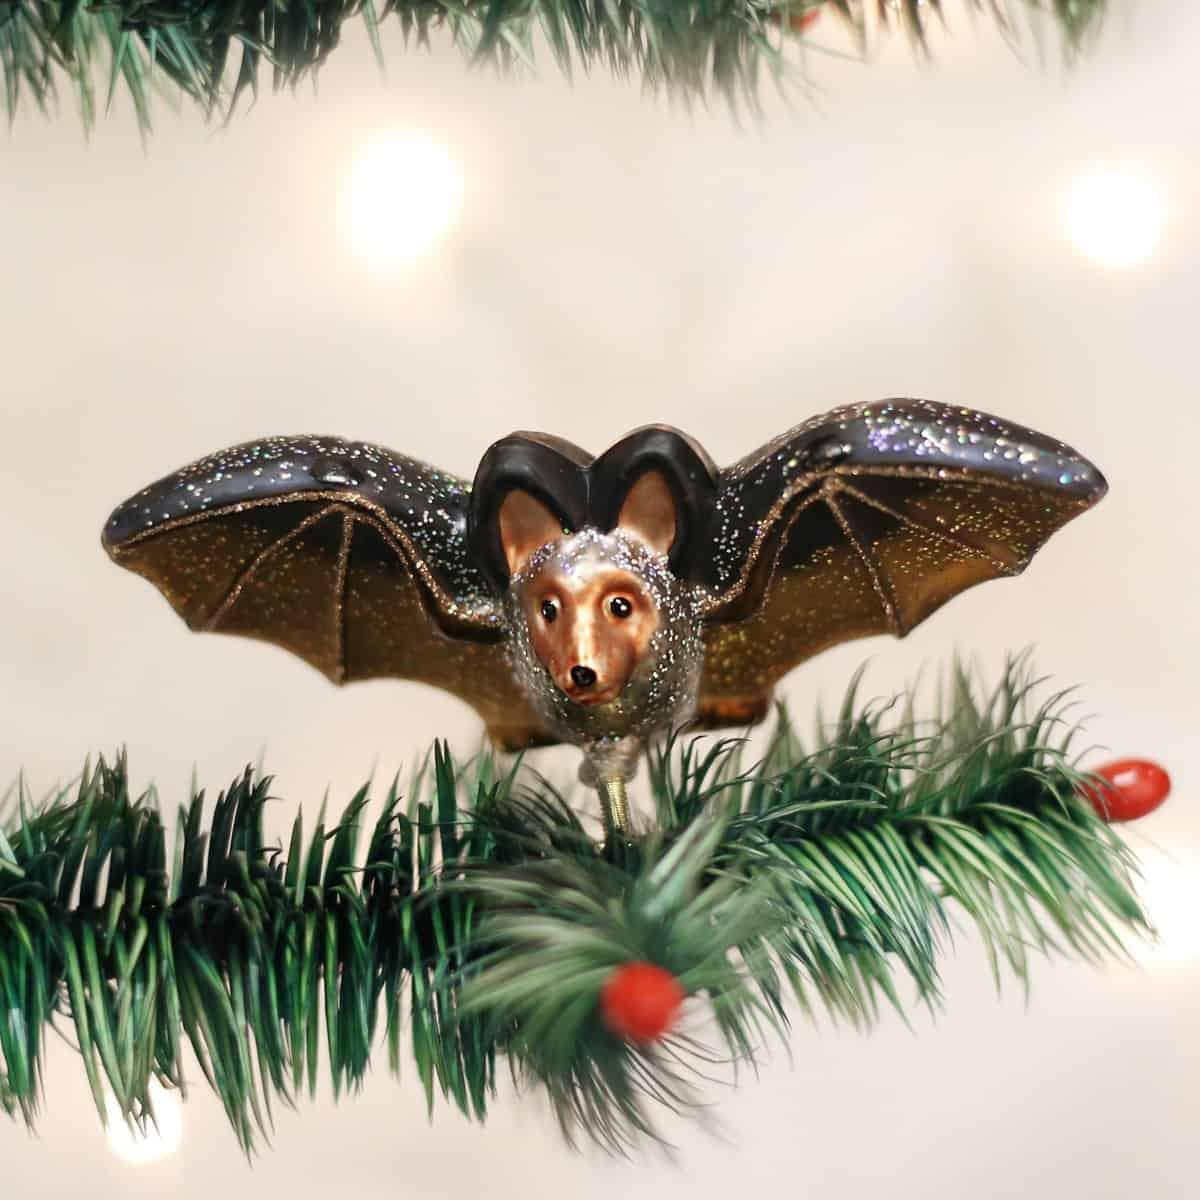 Halloween Bat Figurine Ornaments